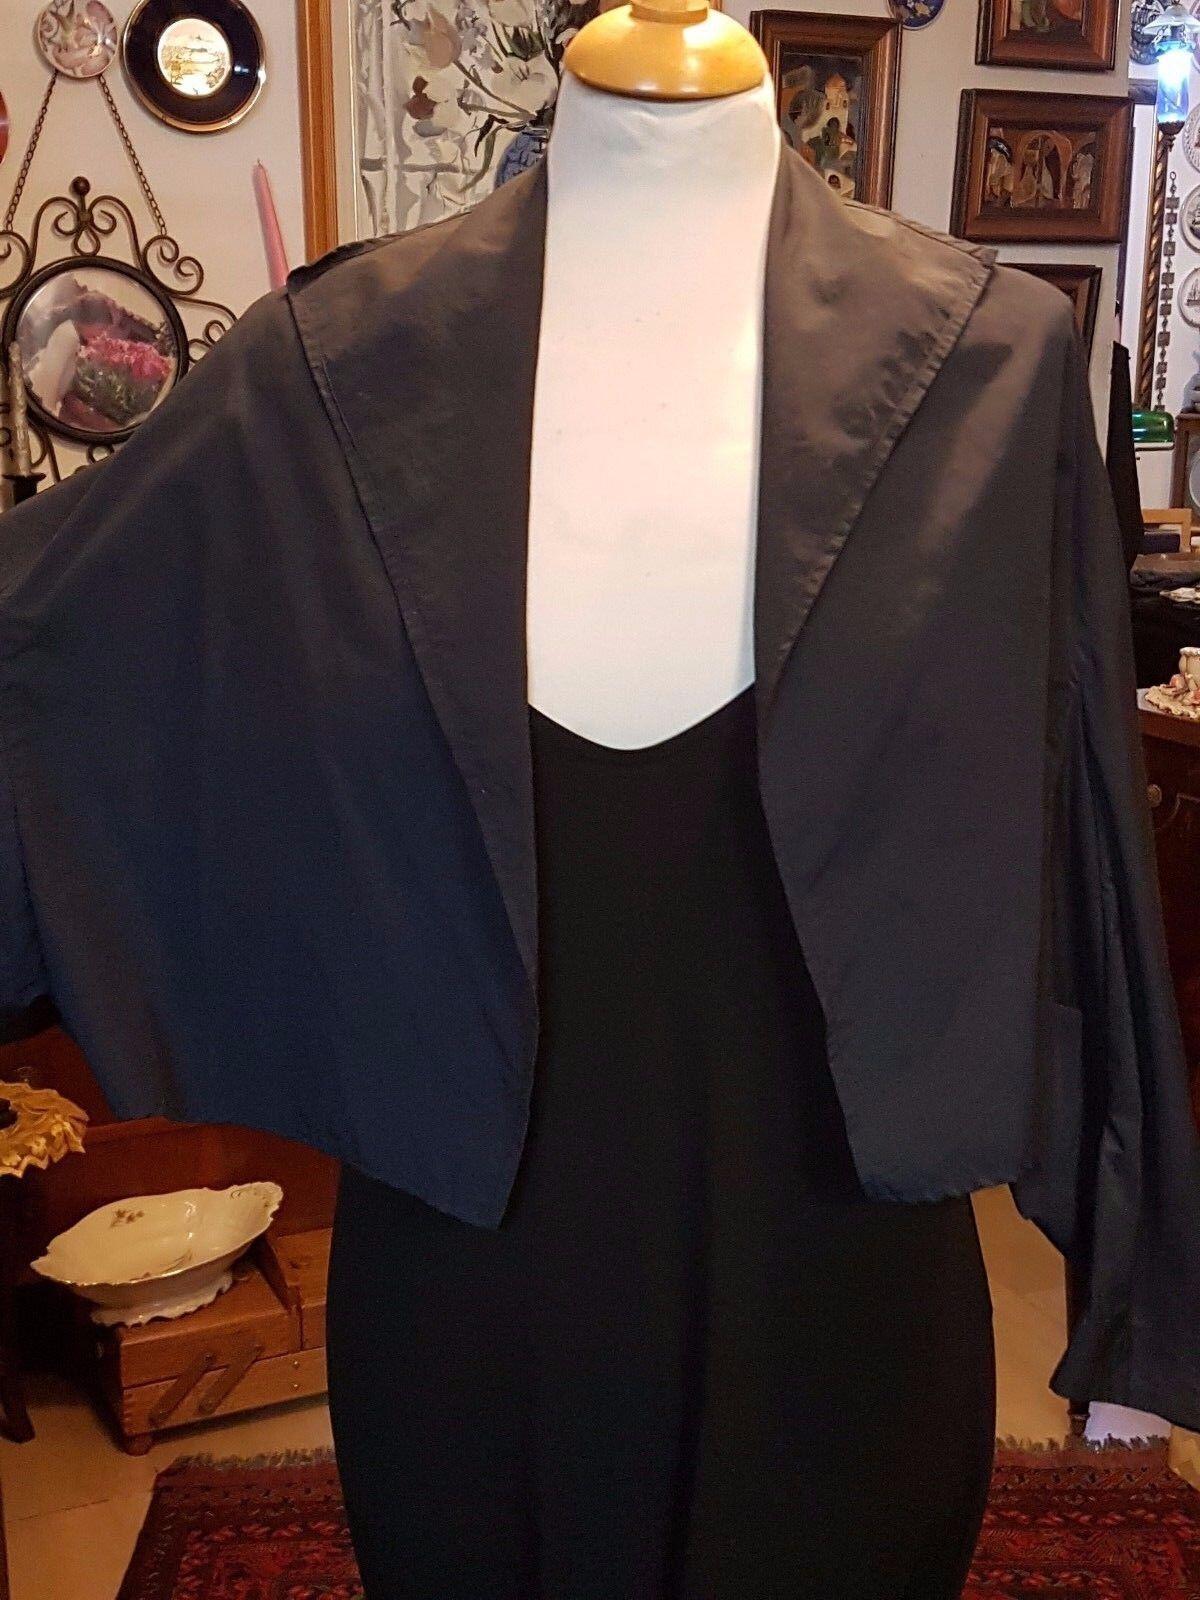 Izas - Noya giacca in Outdoor pile blu Uomo Outdoor in Poliestere  All'aperto Manica lunga ce5ad7